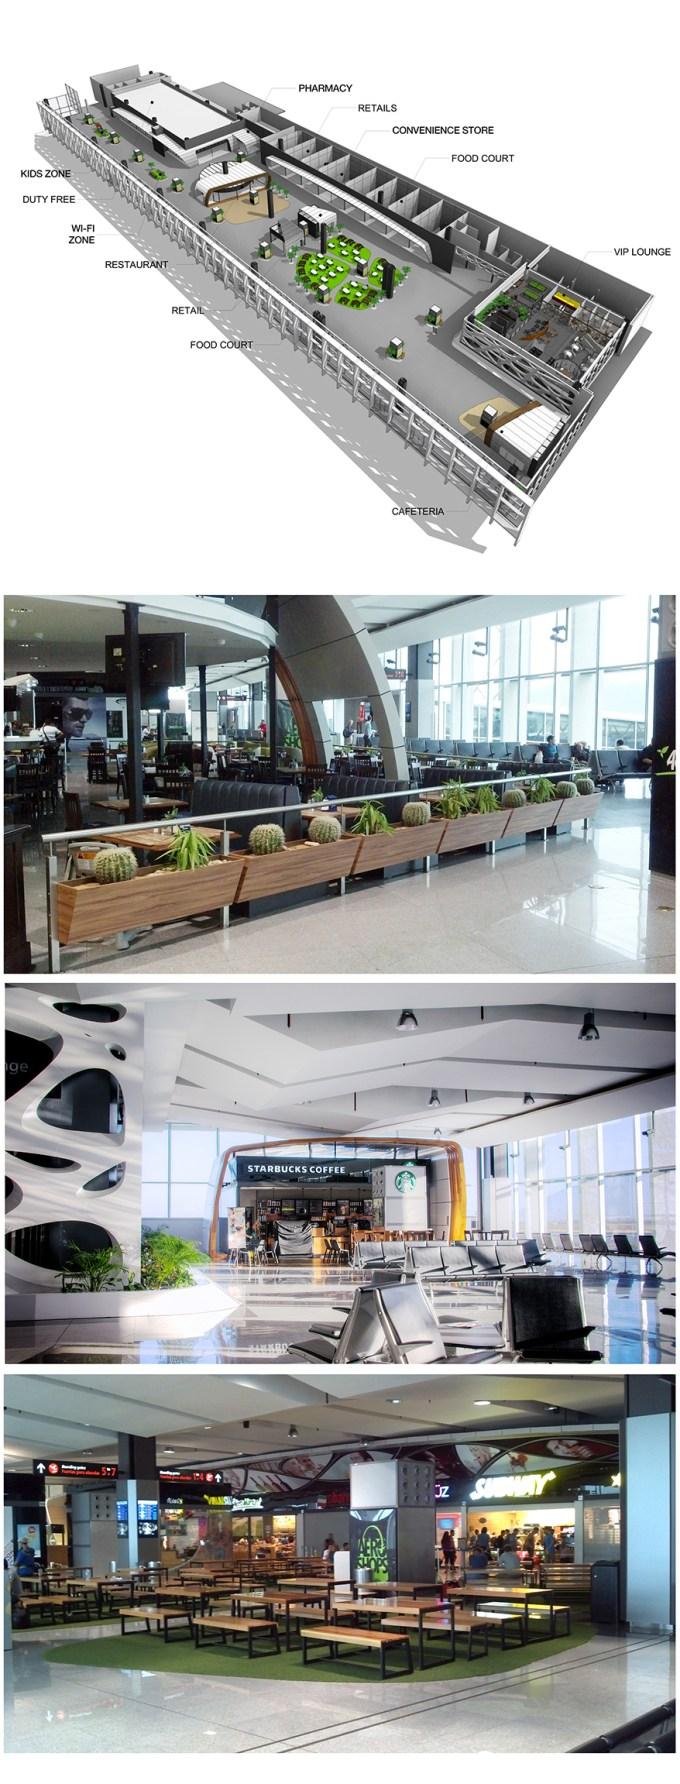 Del cabo airport concessions